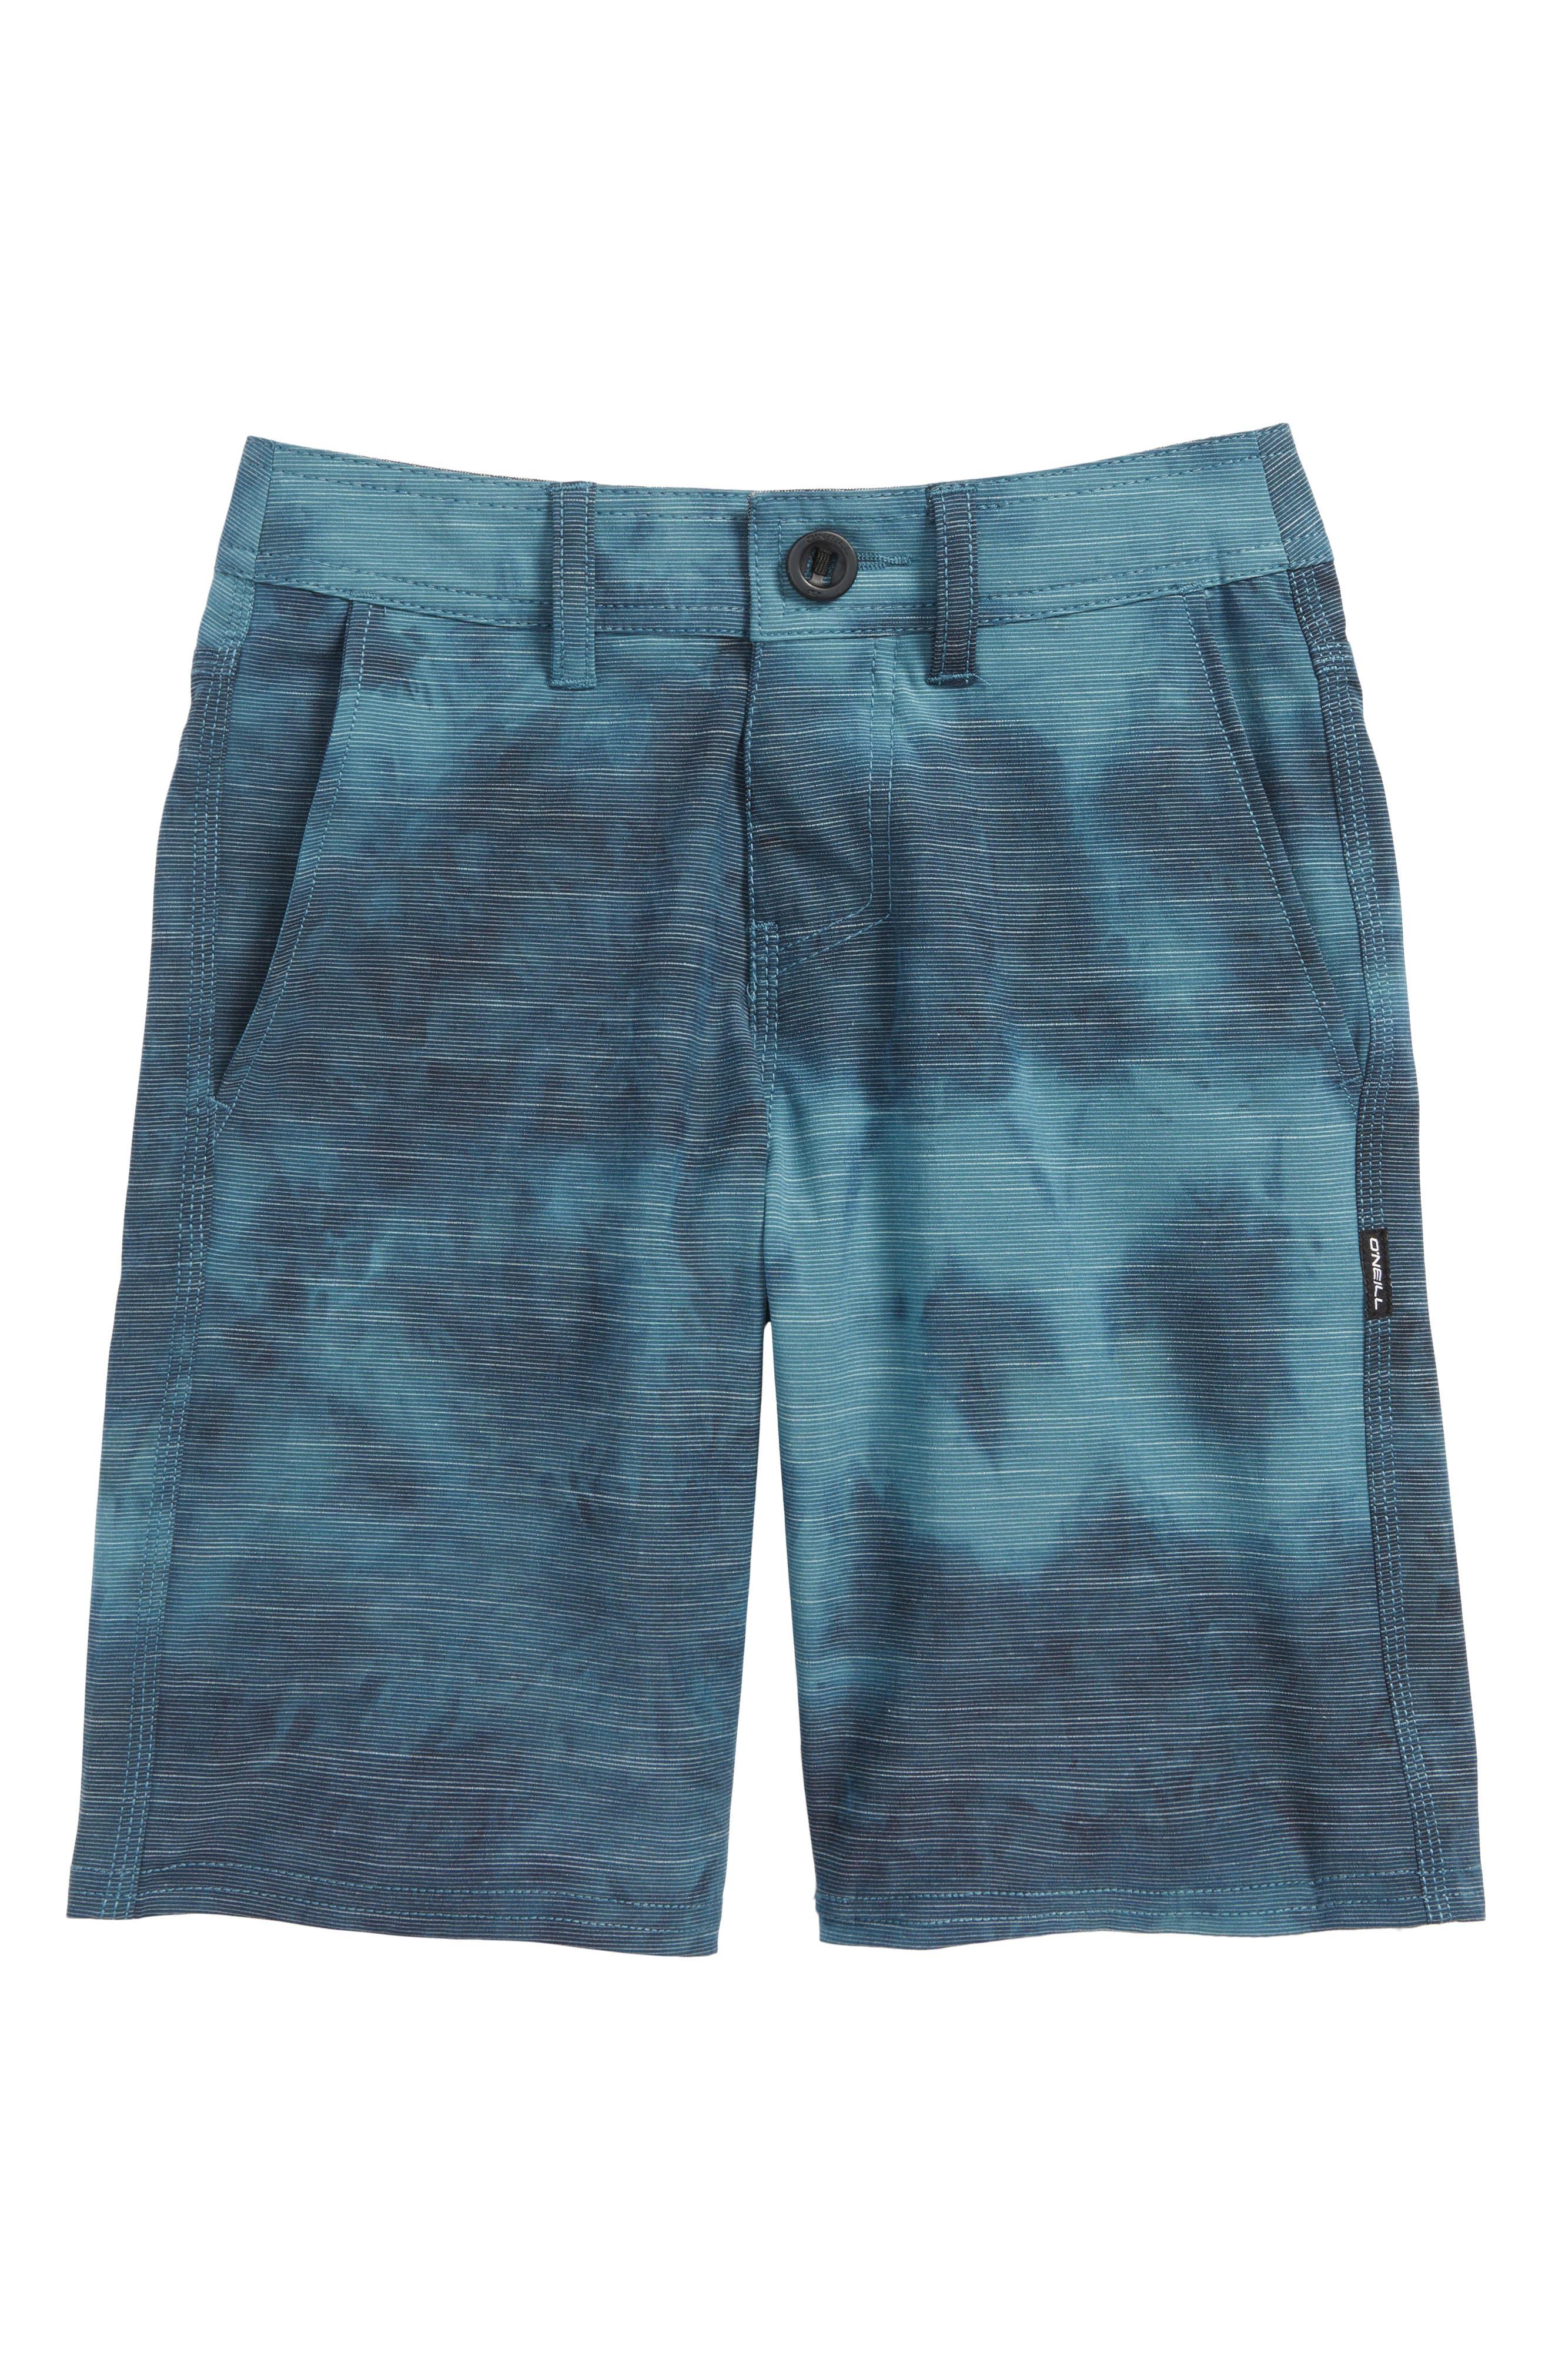 O'Neill Locked Tie Dye Hybrid Shorts (Big Boys)